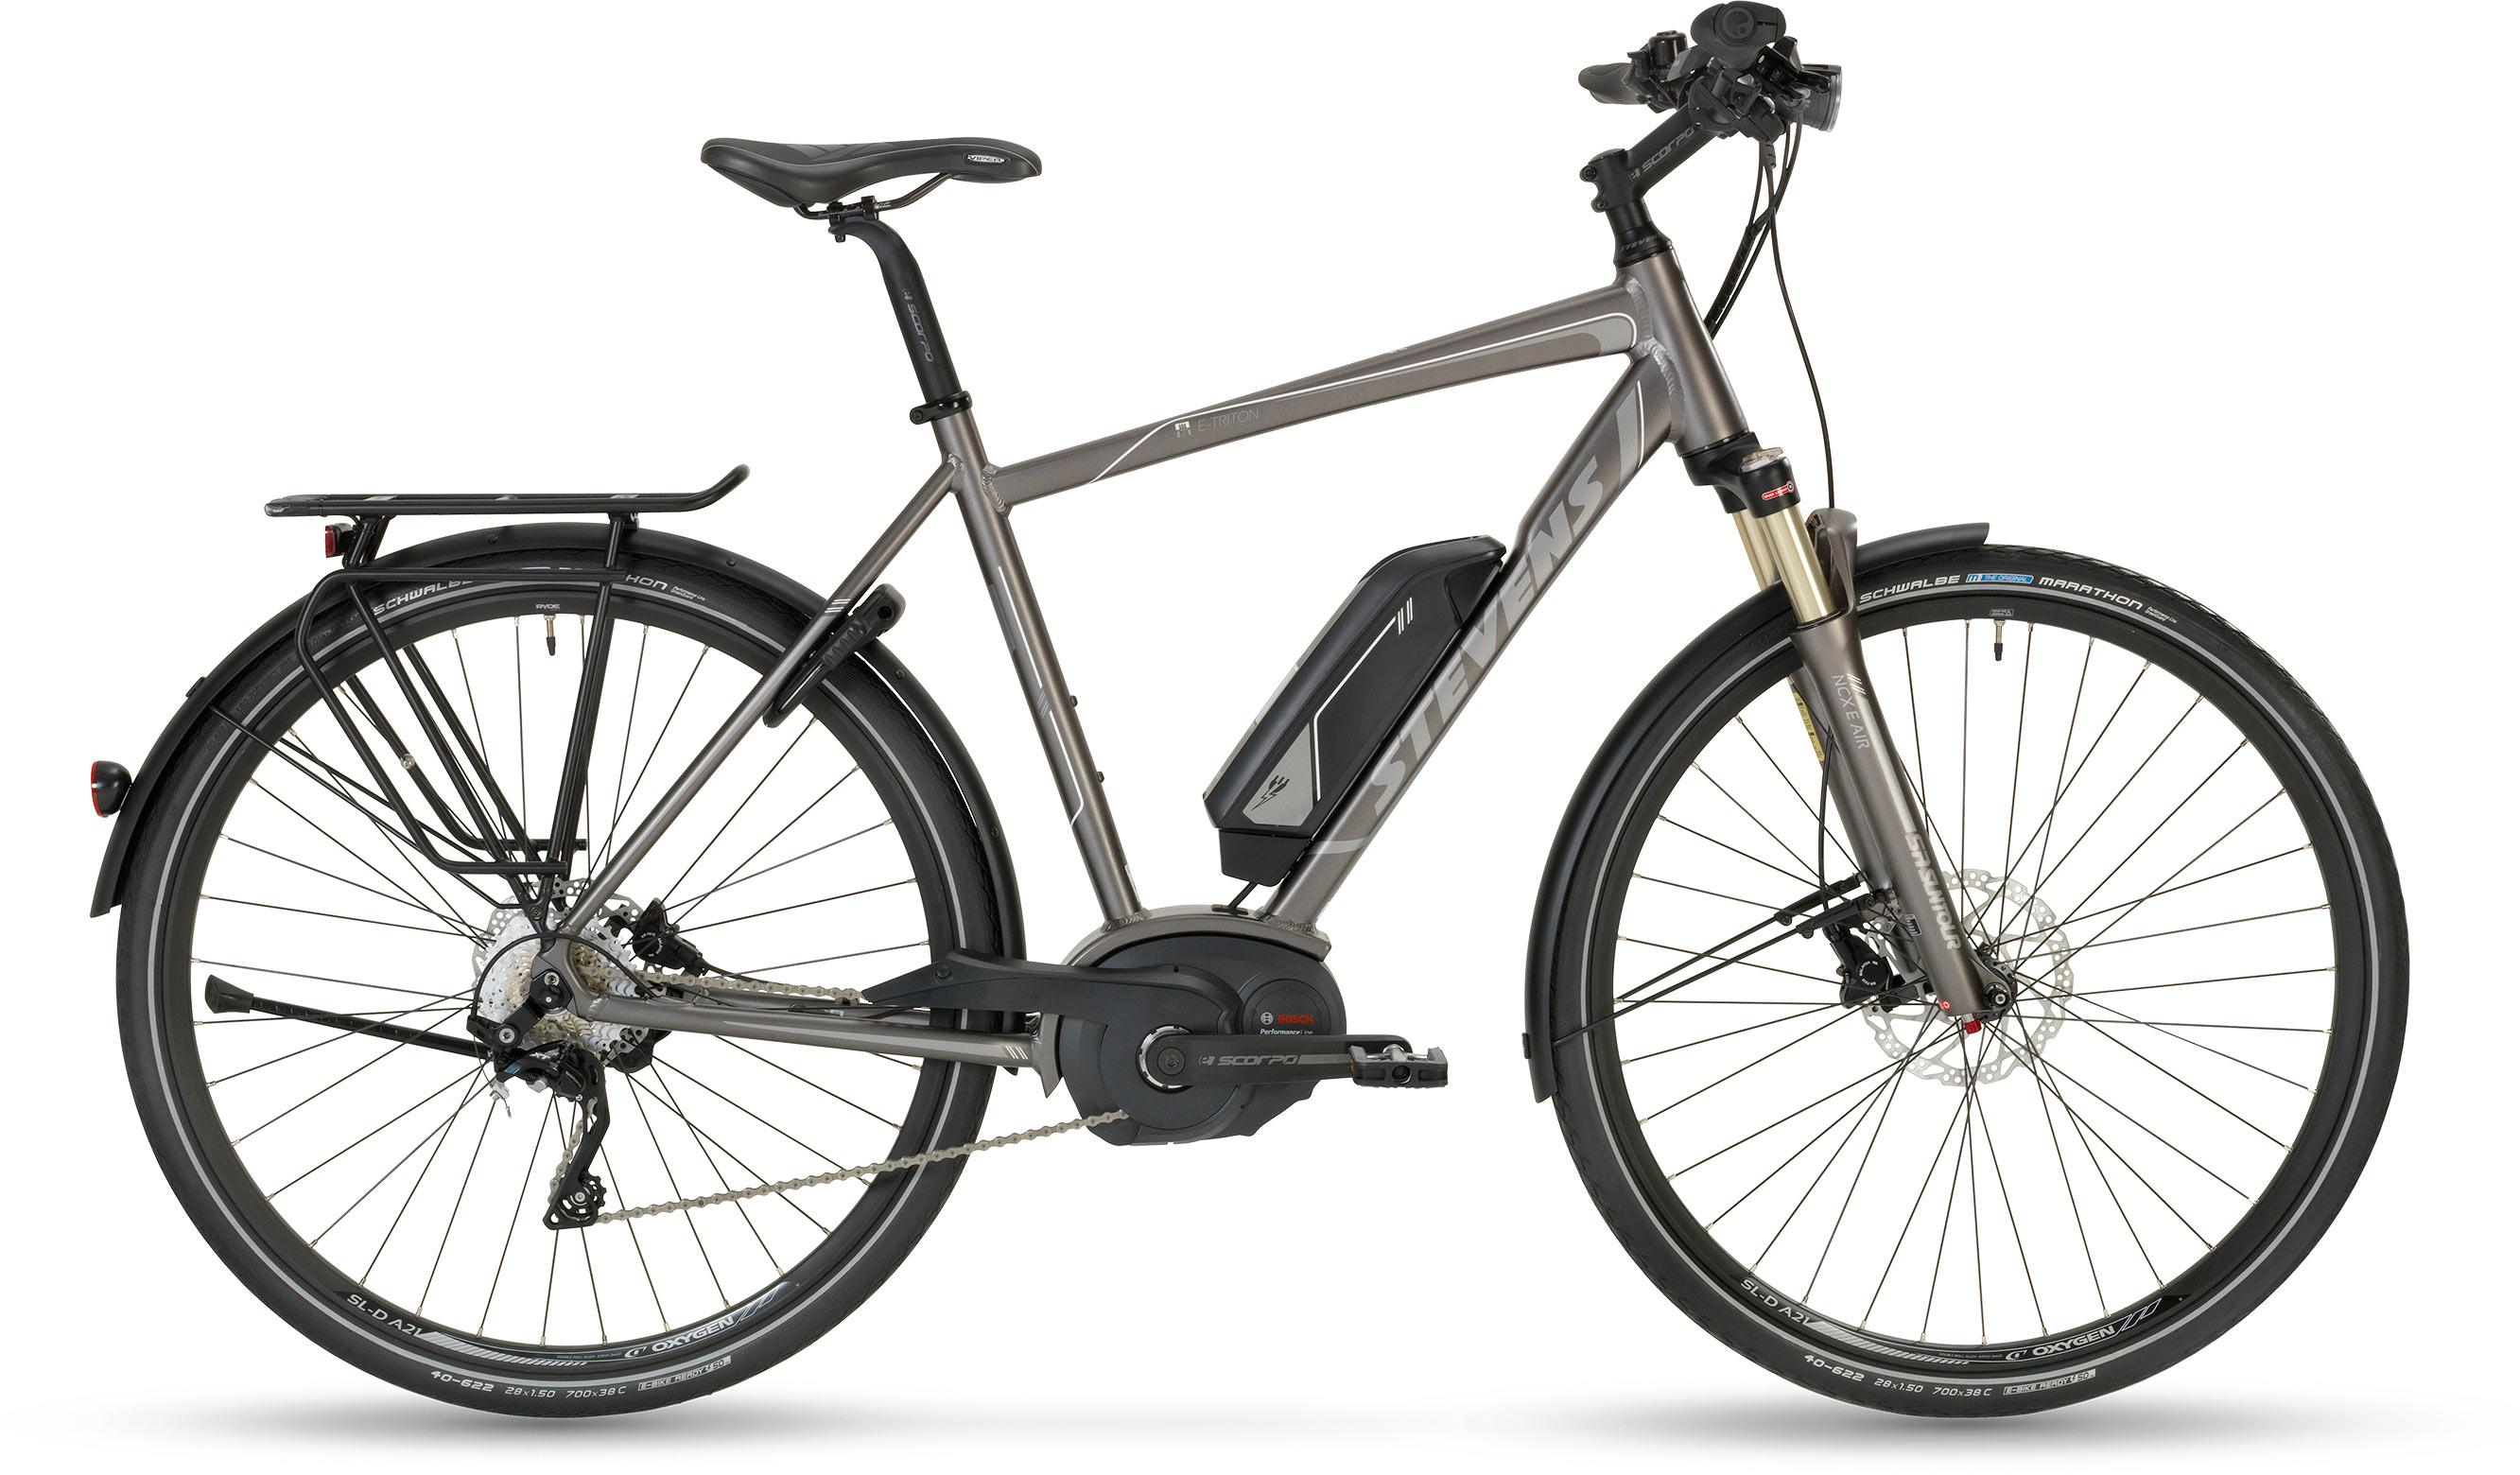 15 Cycling Triban 500 Road Bike Red B Twin Bikes